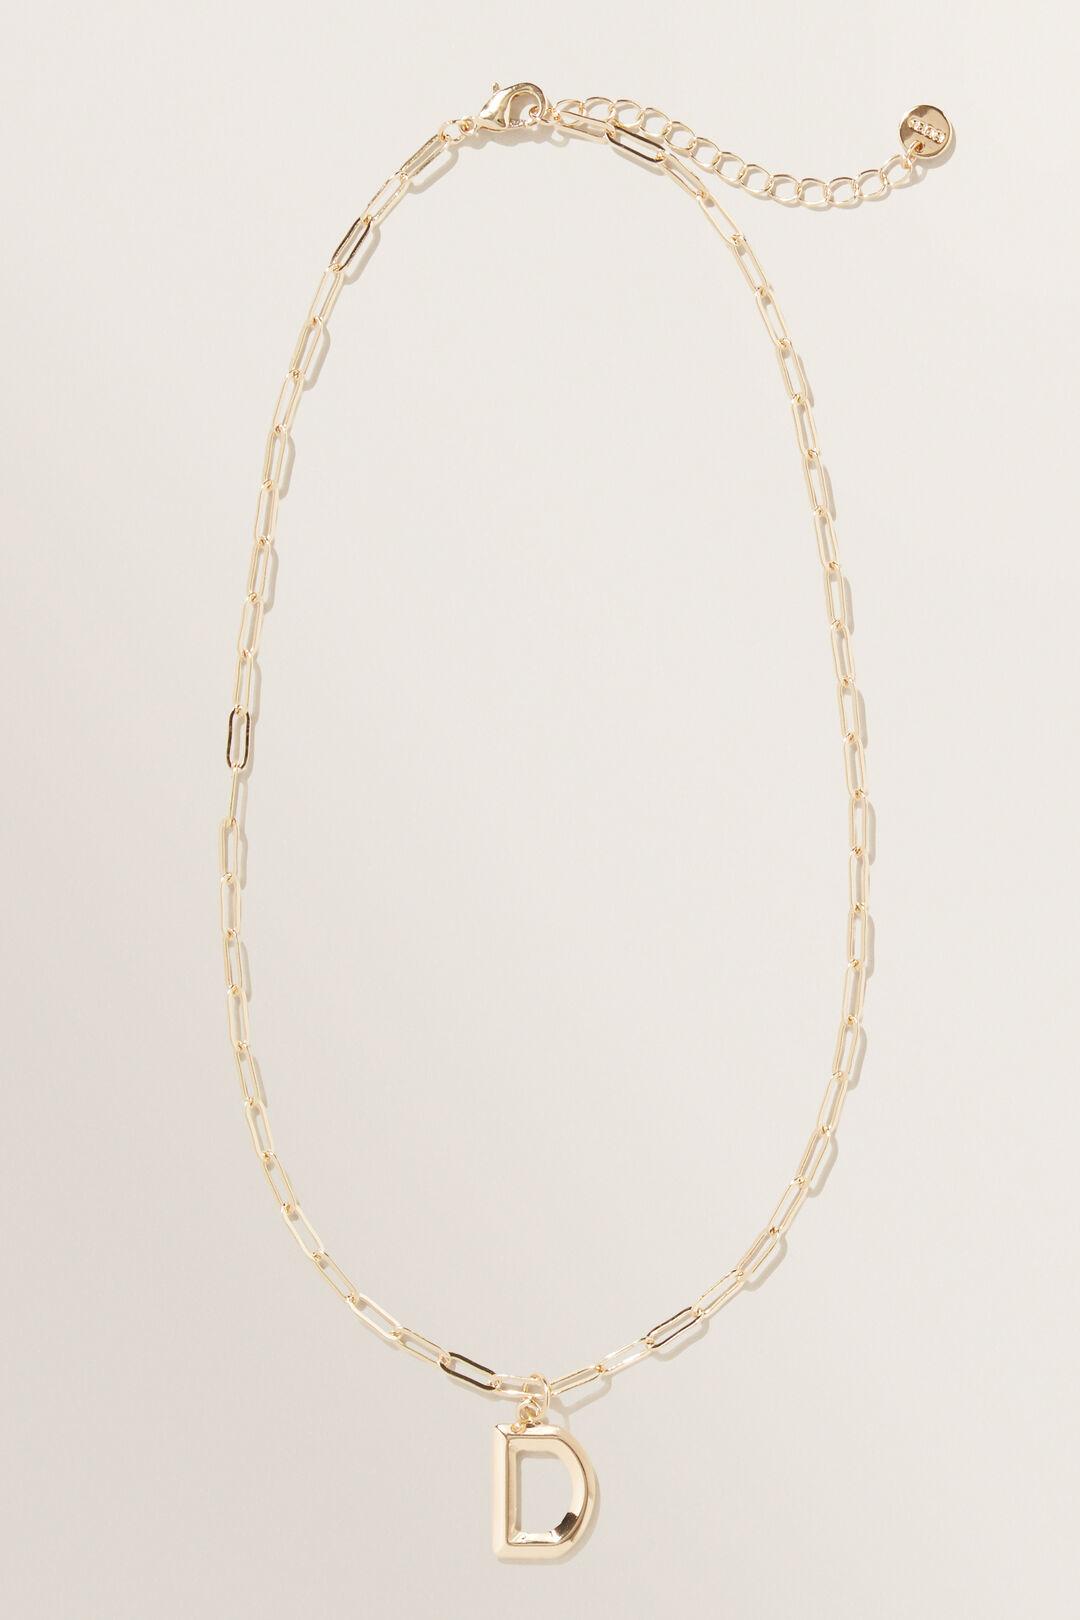 Initial  Chain  Necklace  D  hi-res